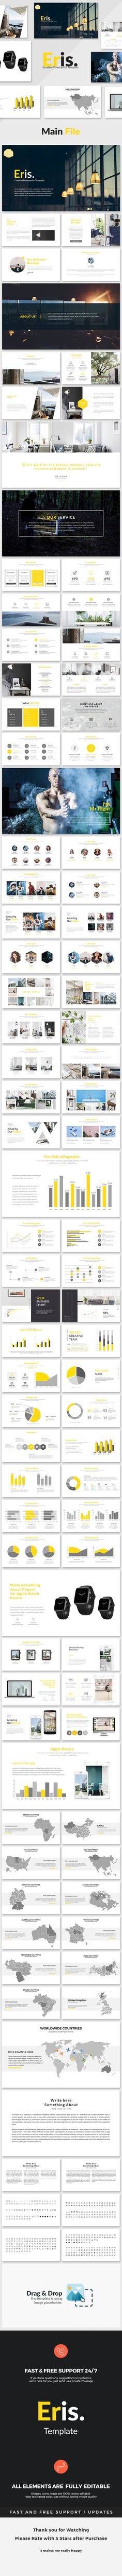 Eris - Creative Powerpoint Template  #marketing #clean • Download ➝ https://graphicriver.net/item/eris-creative-powerpoint-template/18138869?ref=pxcr